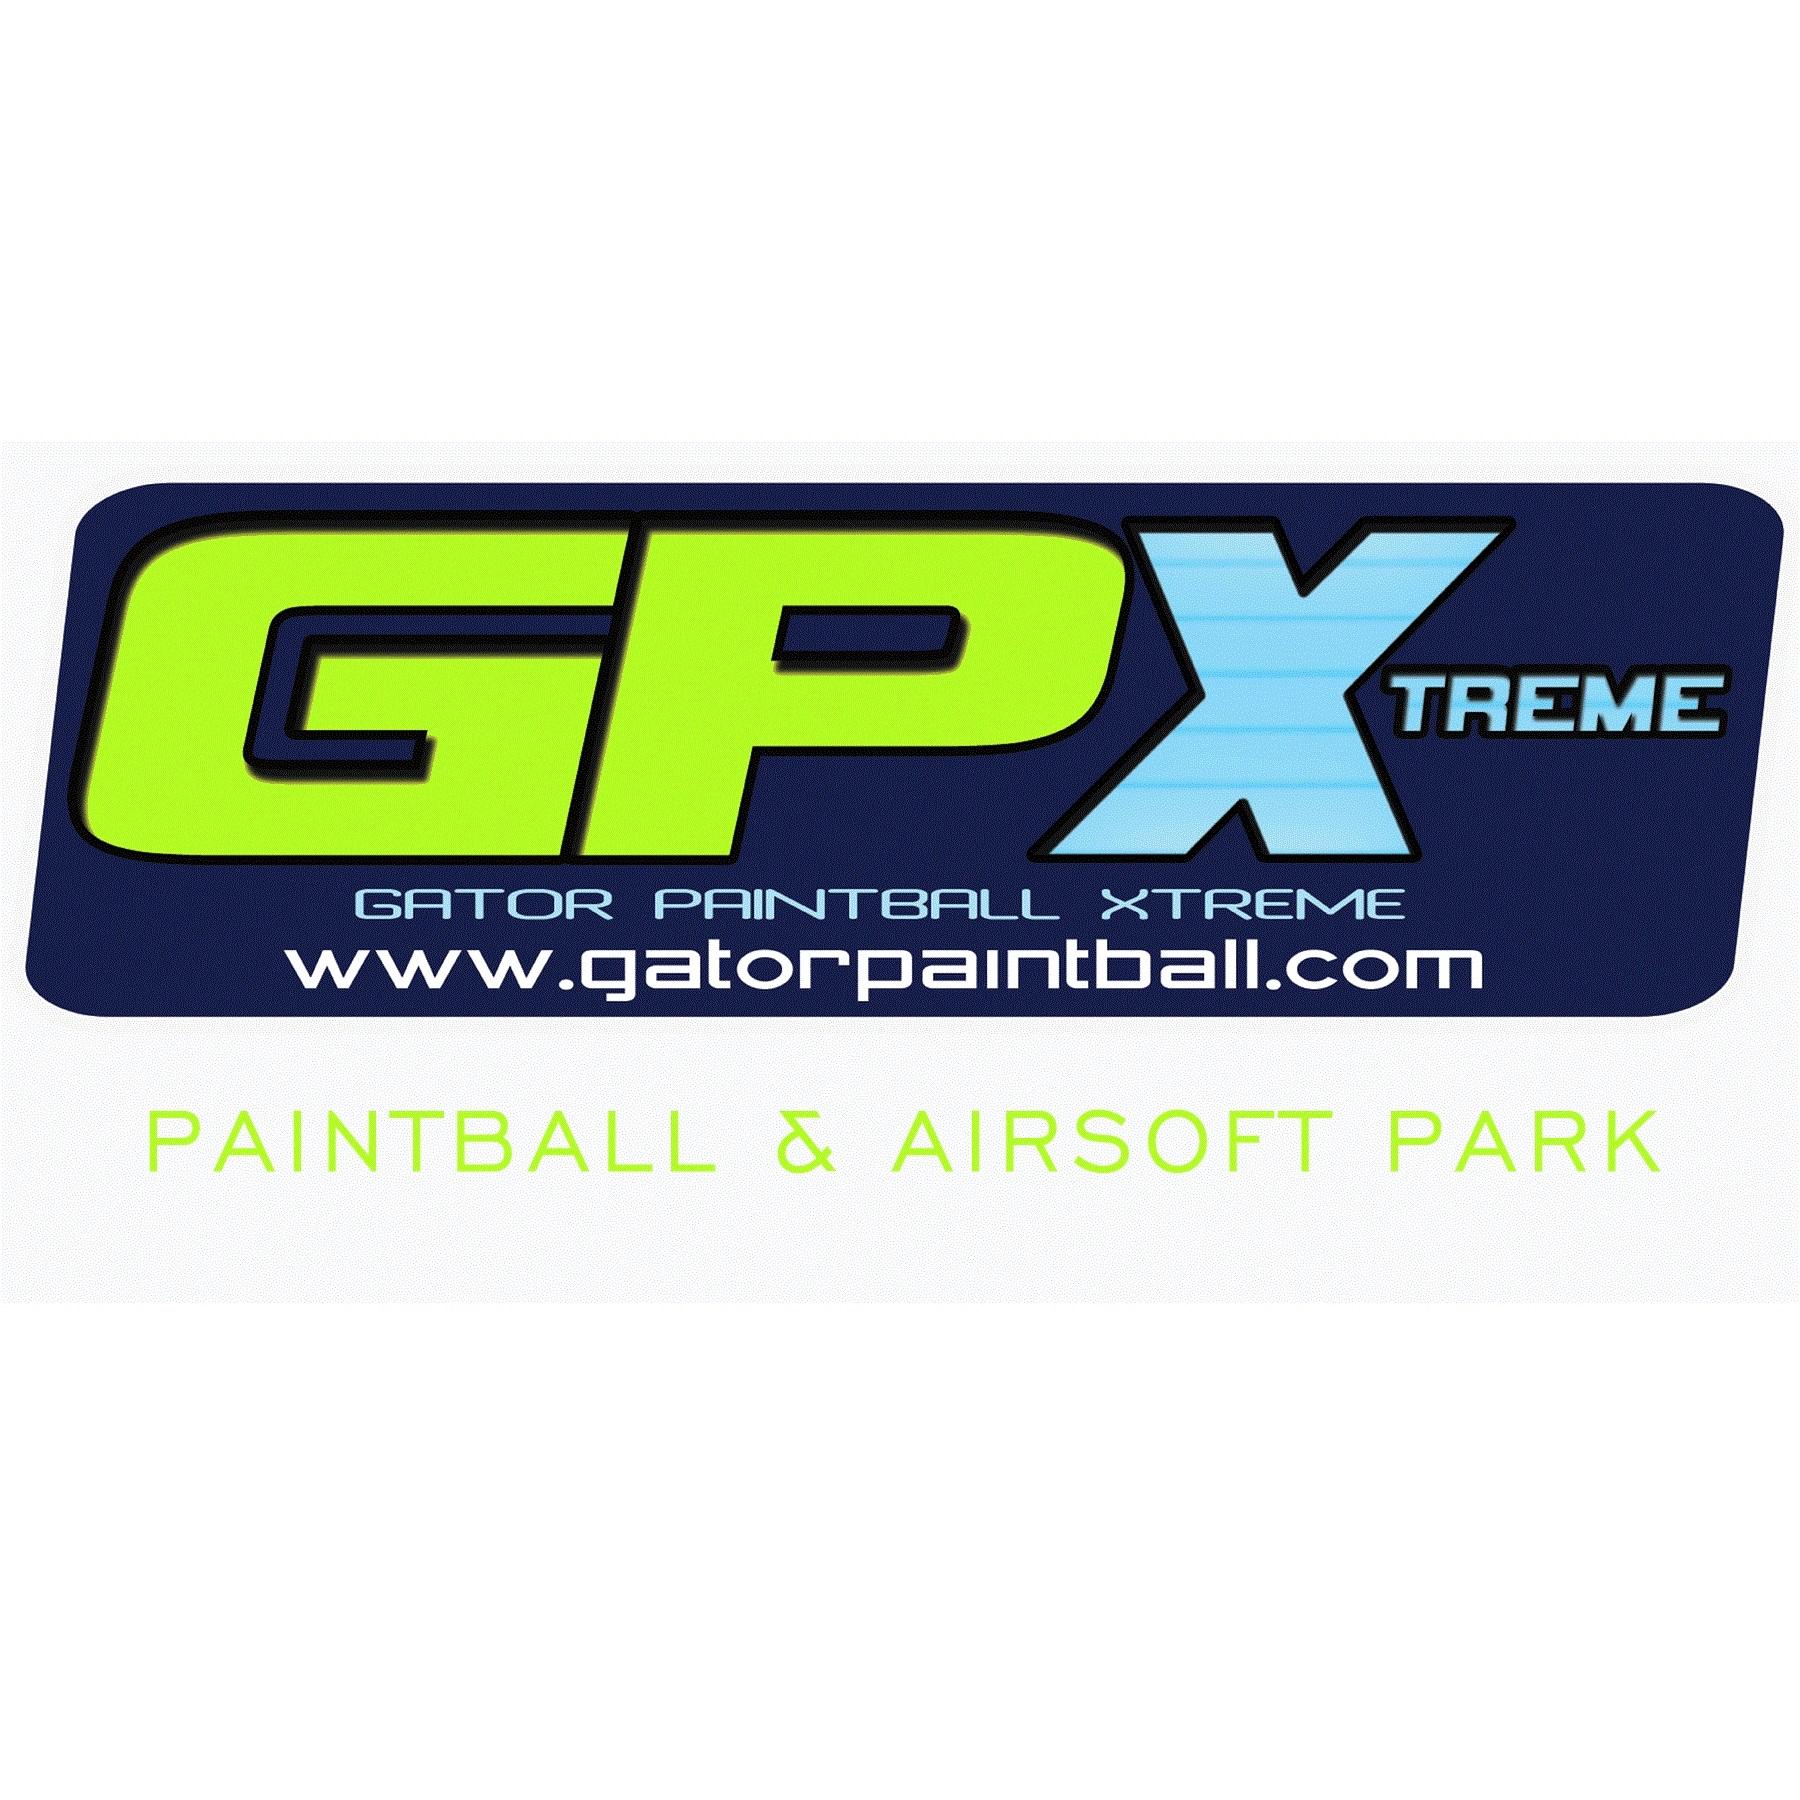 Gator Paintball Extreme